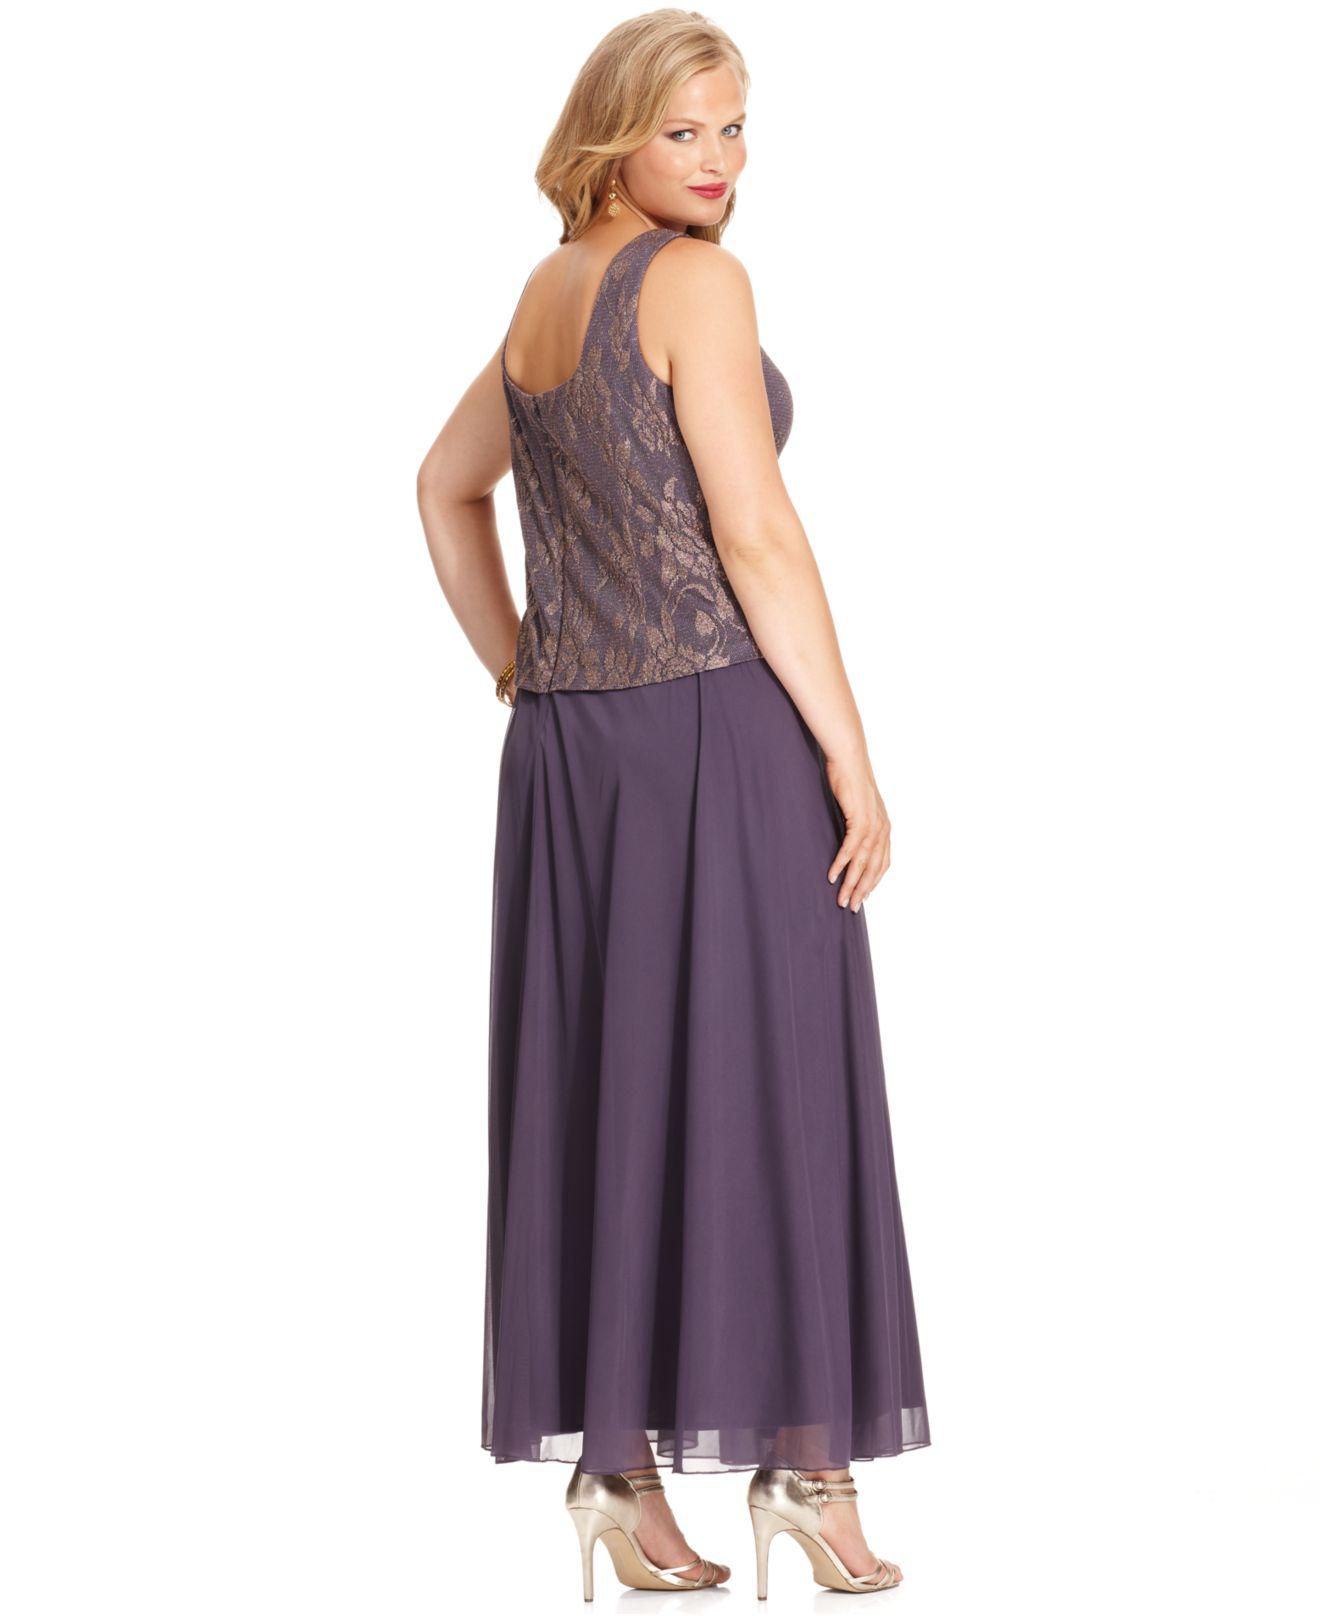 4883e84486c23 Lyst - Patra Plus Metallic Lace Dress And Jacket in Purple